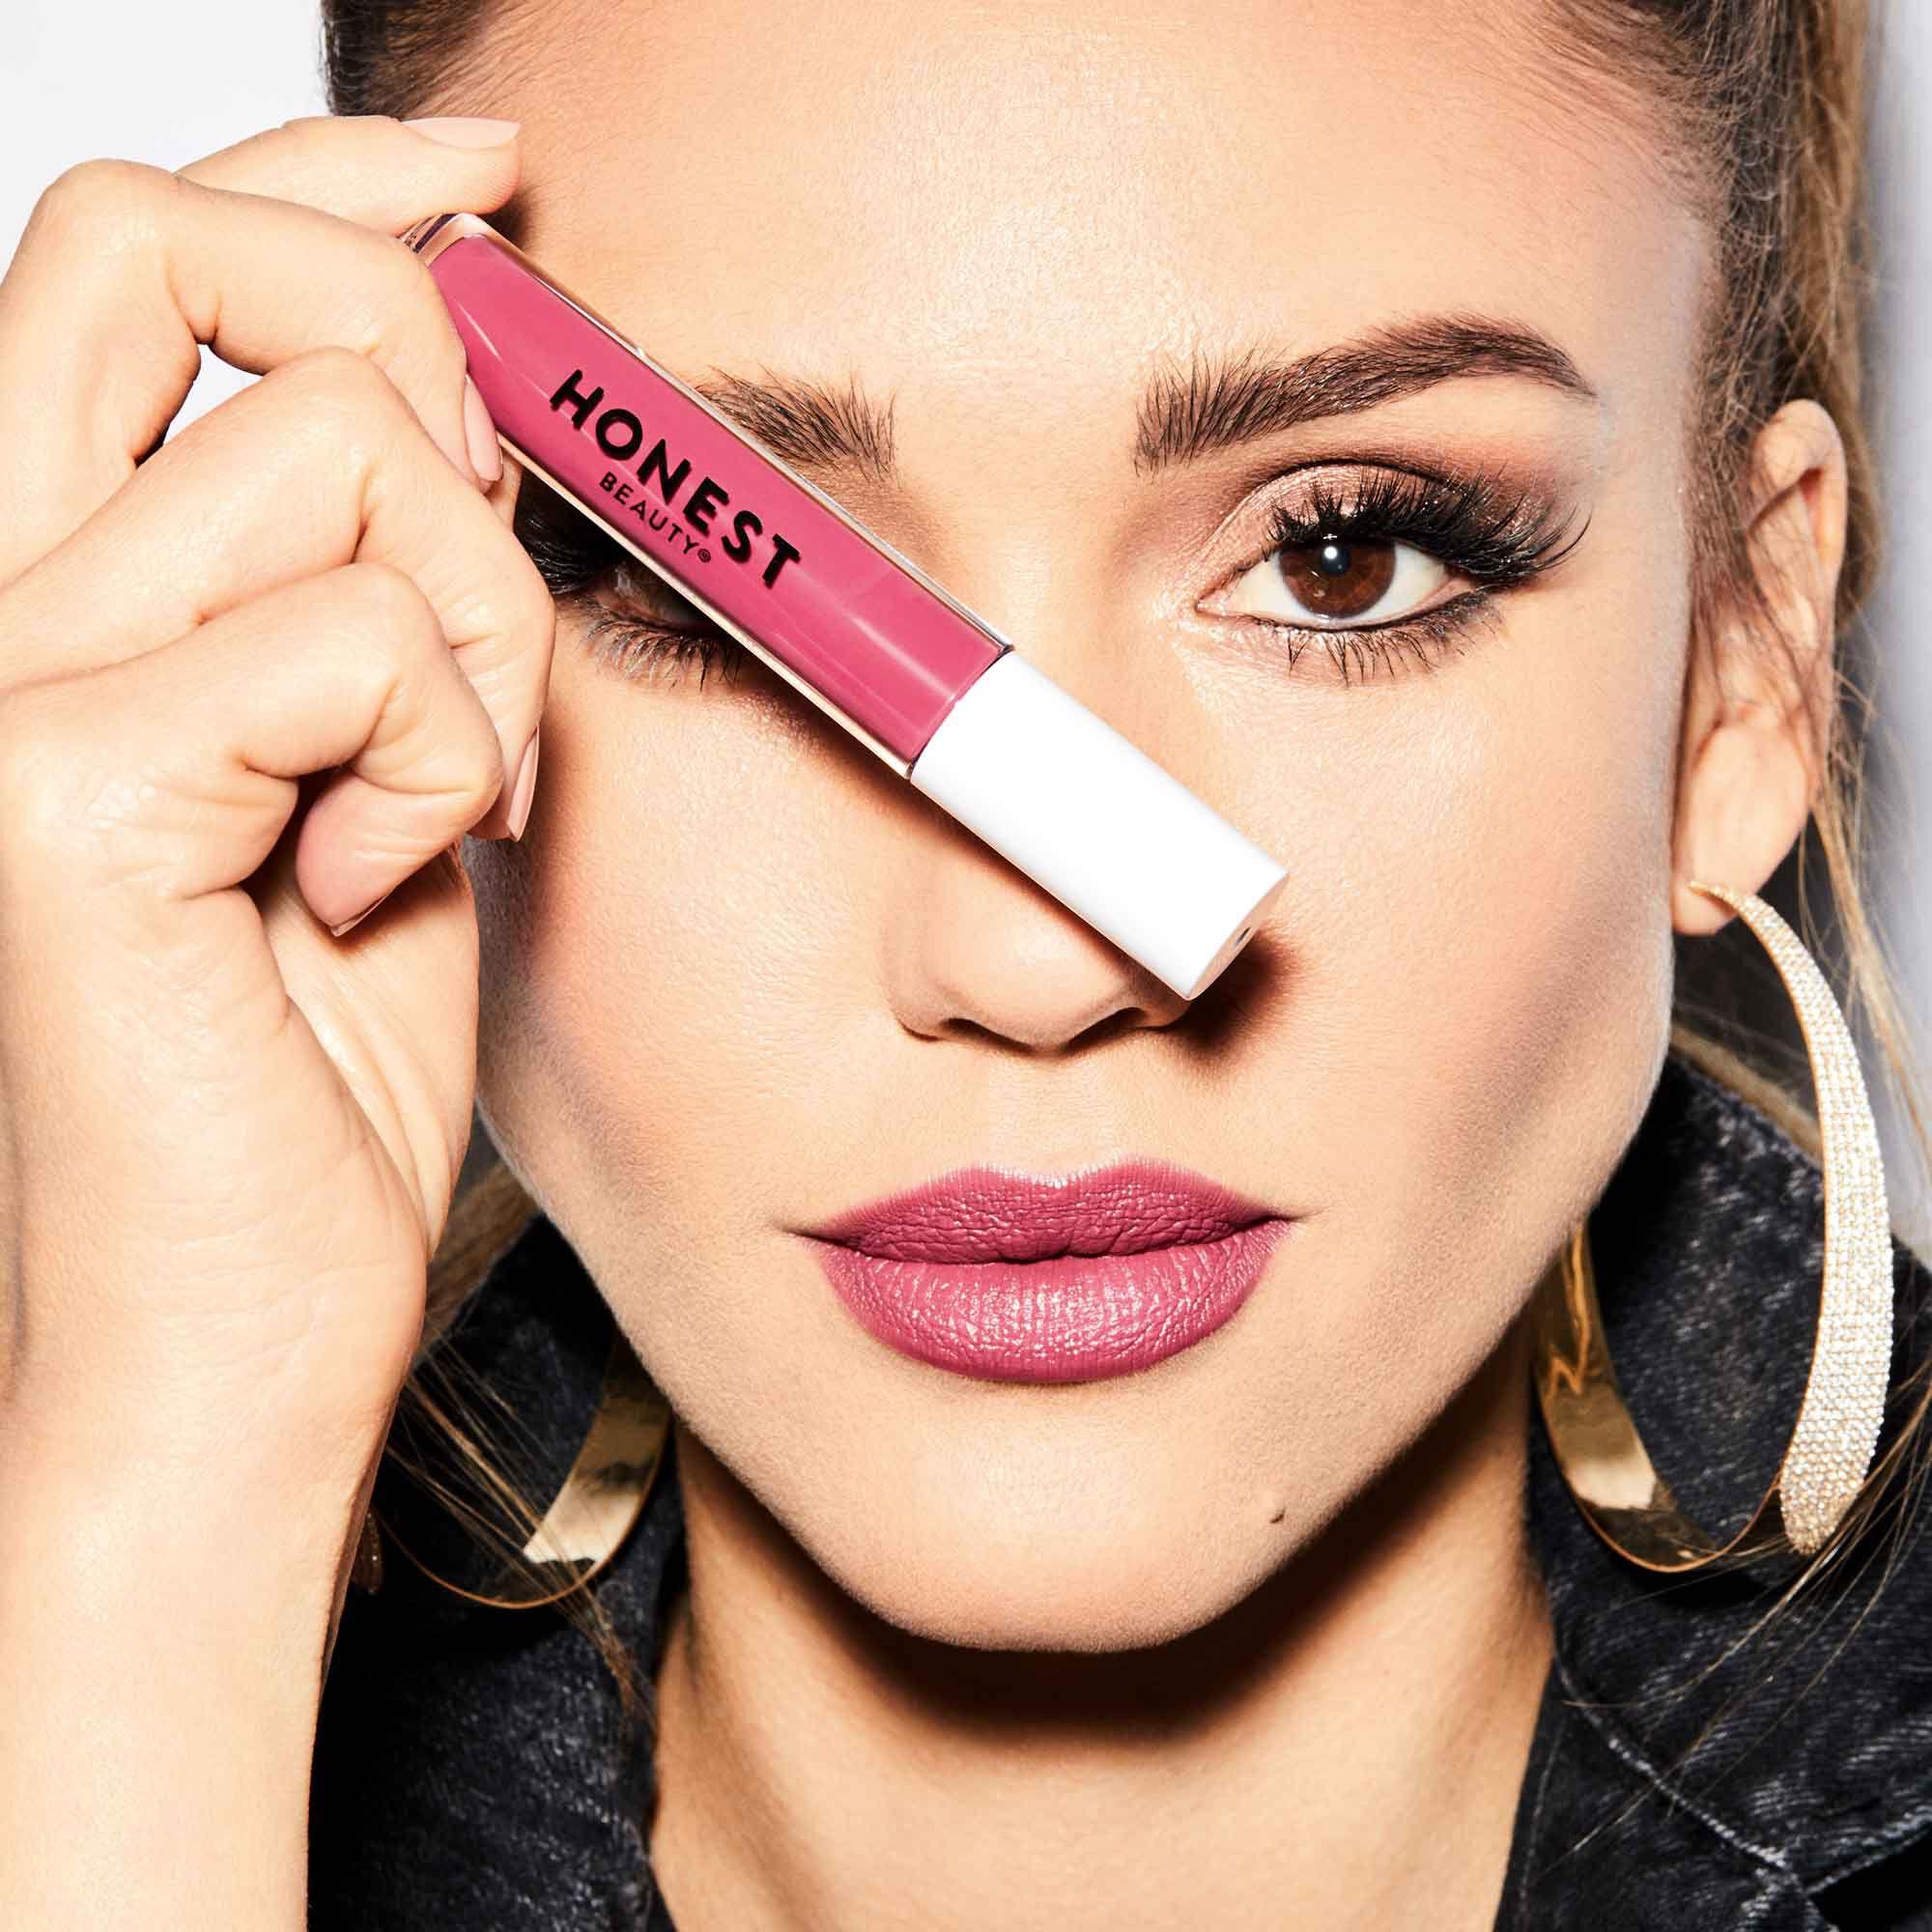 jessica alba with the passion lipstick